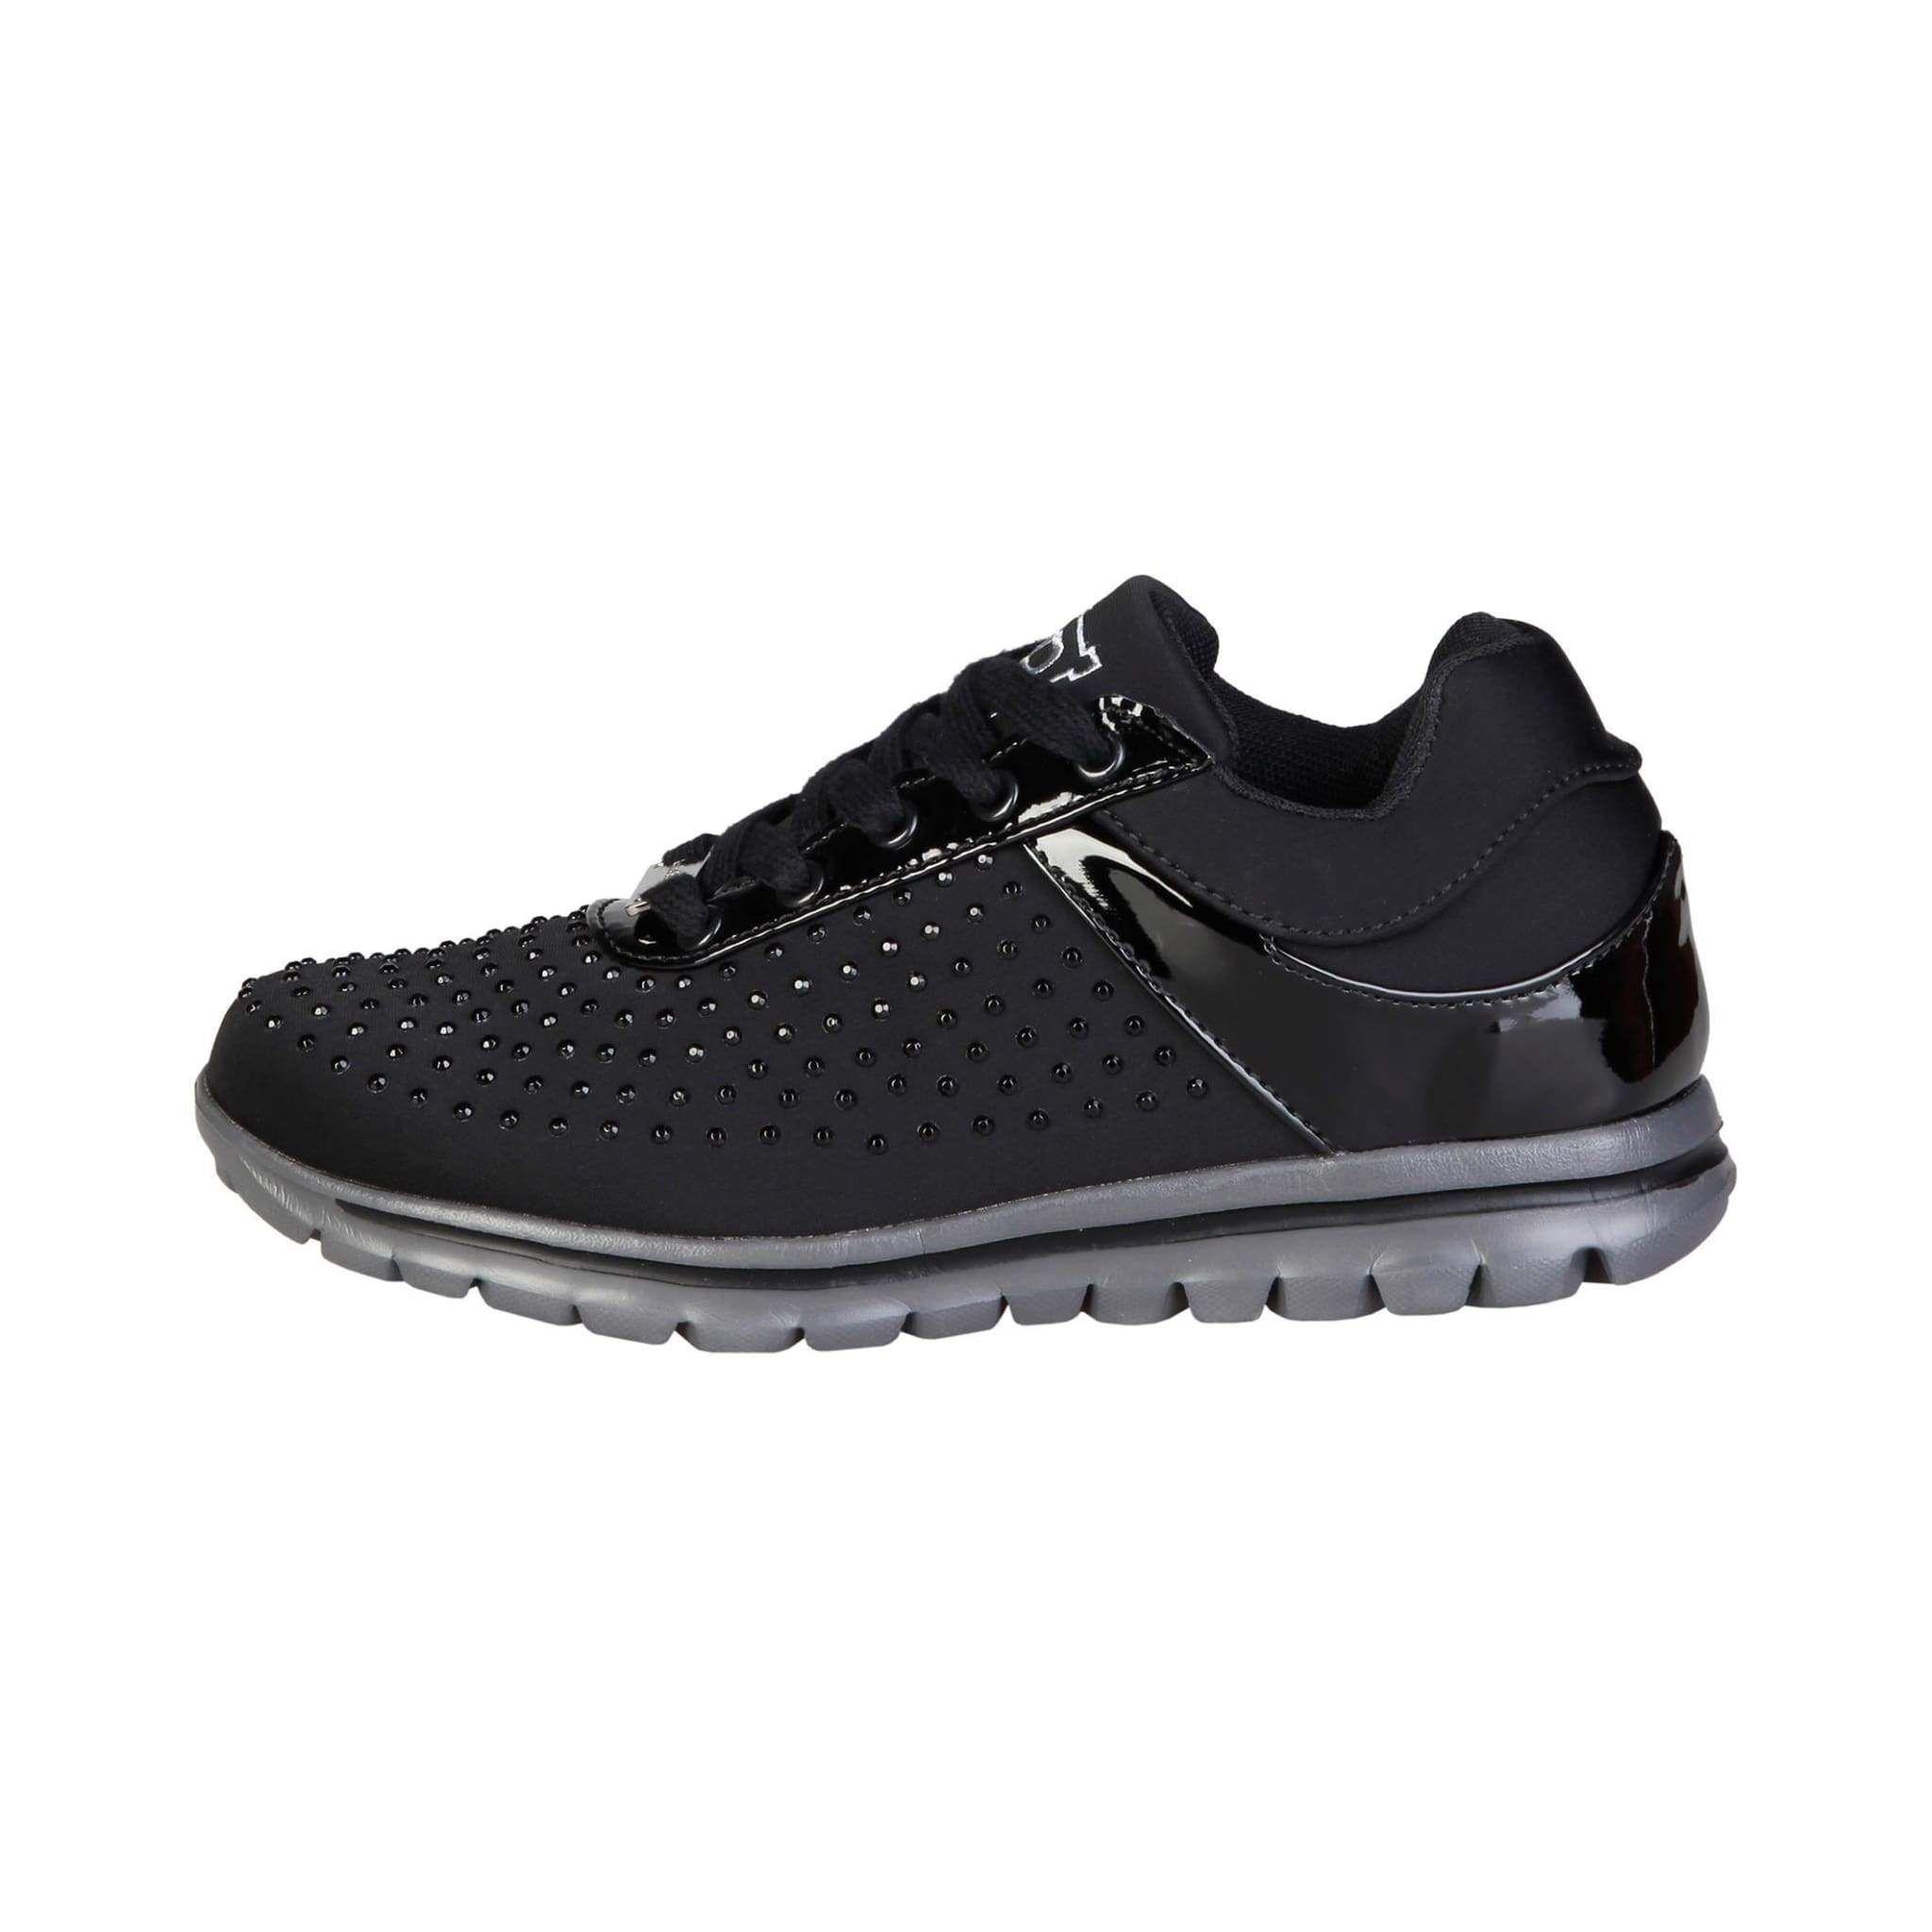 f22e3941a8da Original New Arrival Authentic Nike Lebron XV KSA Men s Comfortable  Basketball Shoes Sport Outdoor Sneakers AR4831-900 in 2019